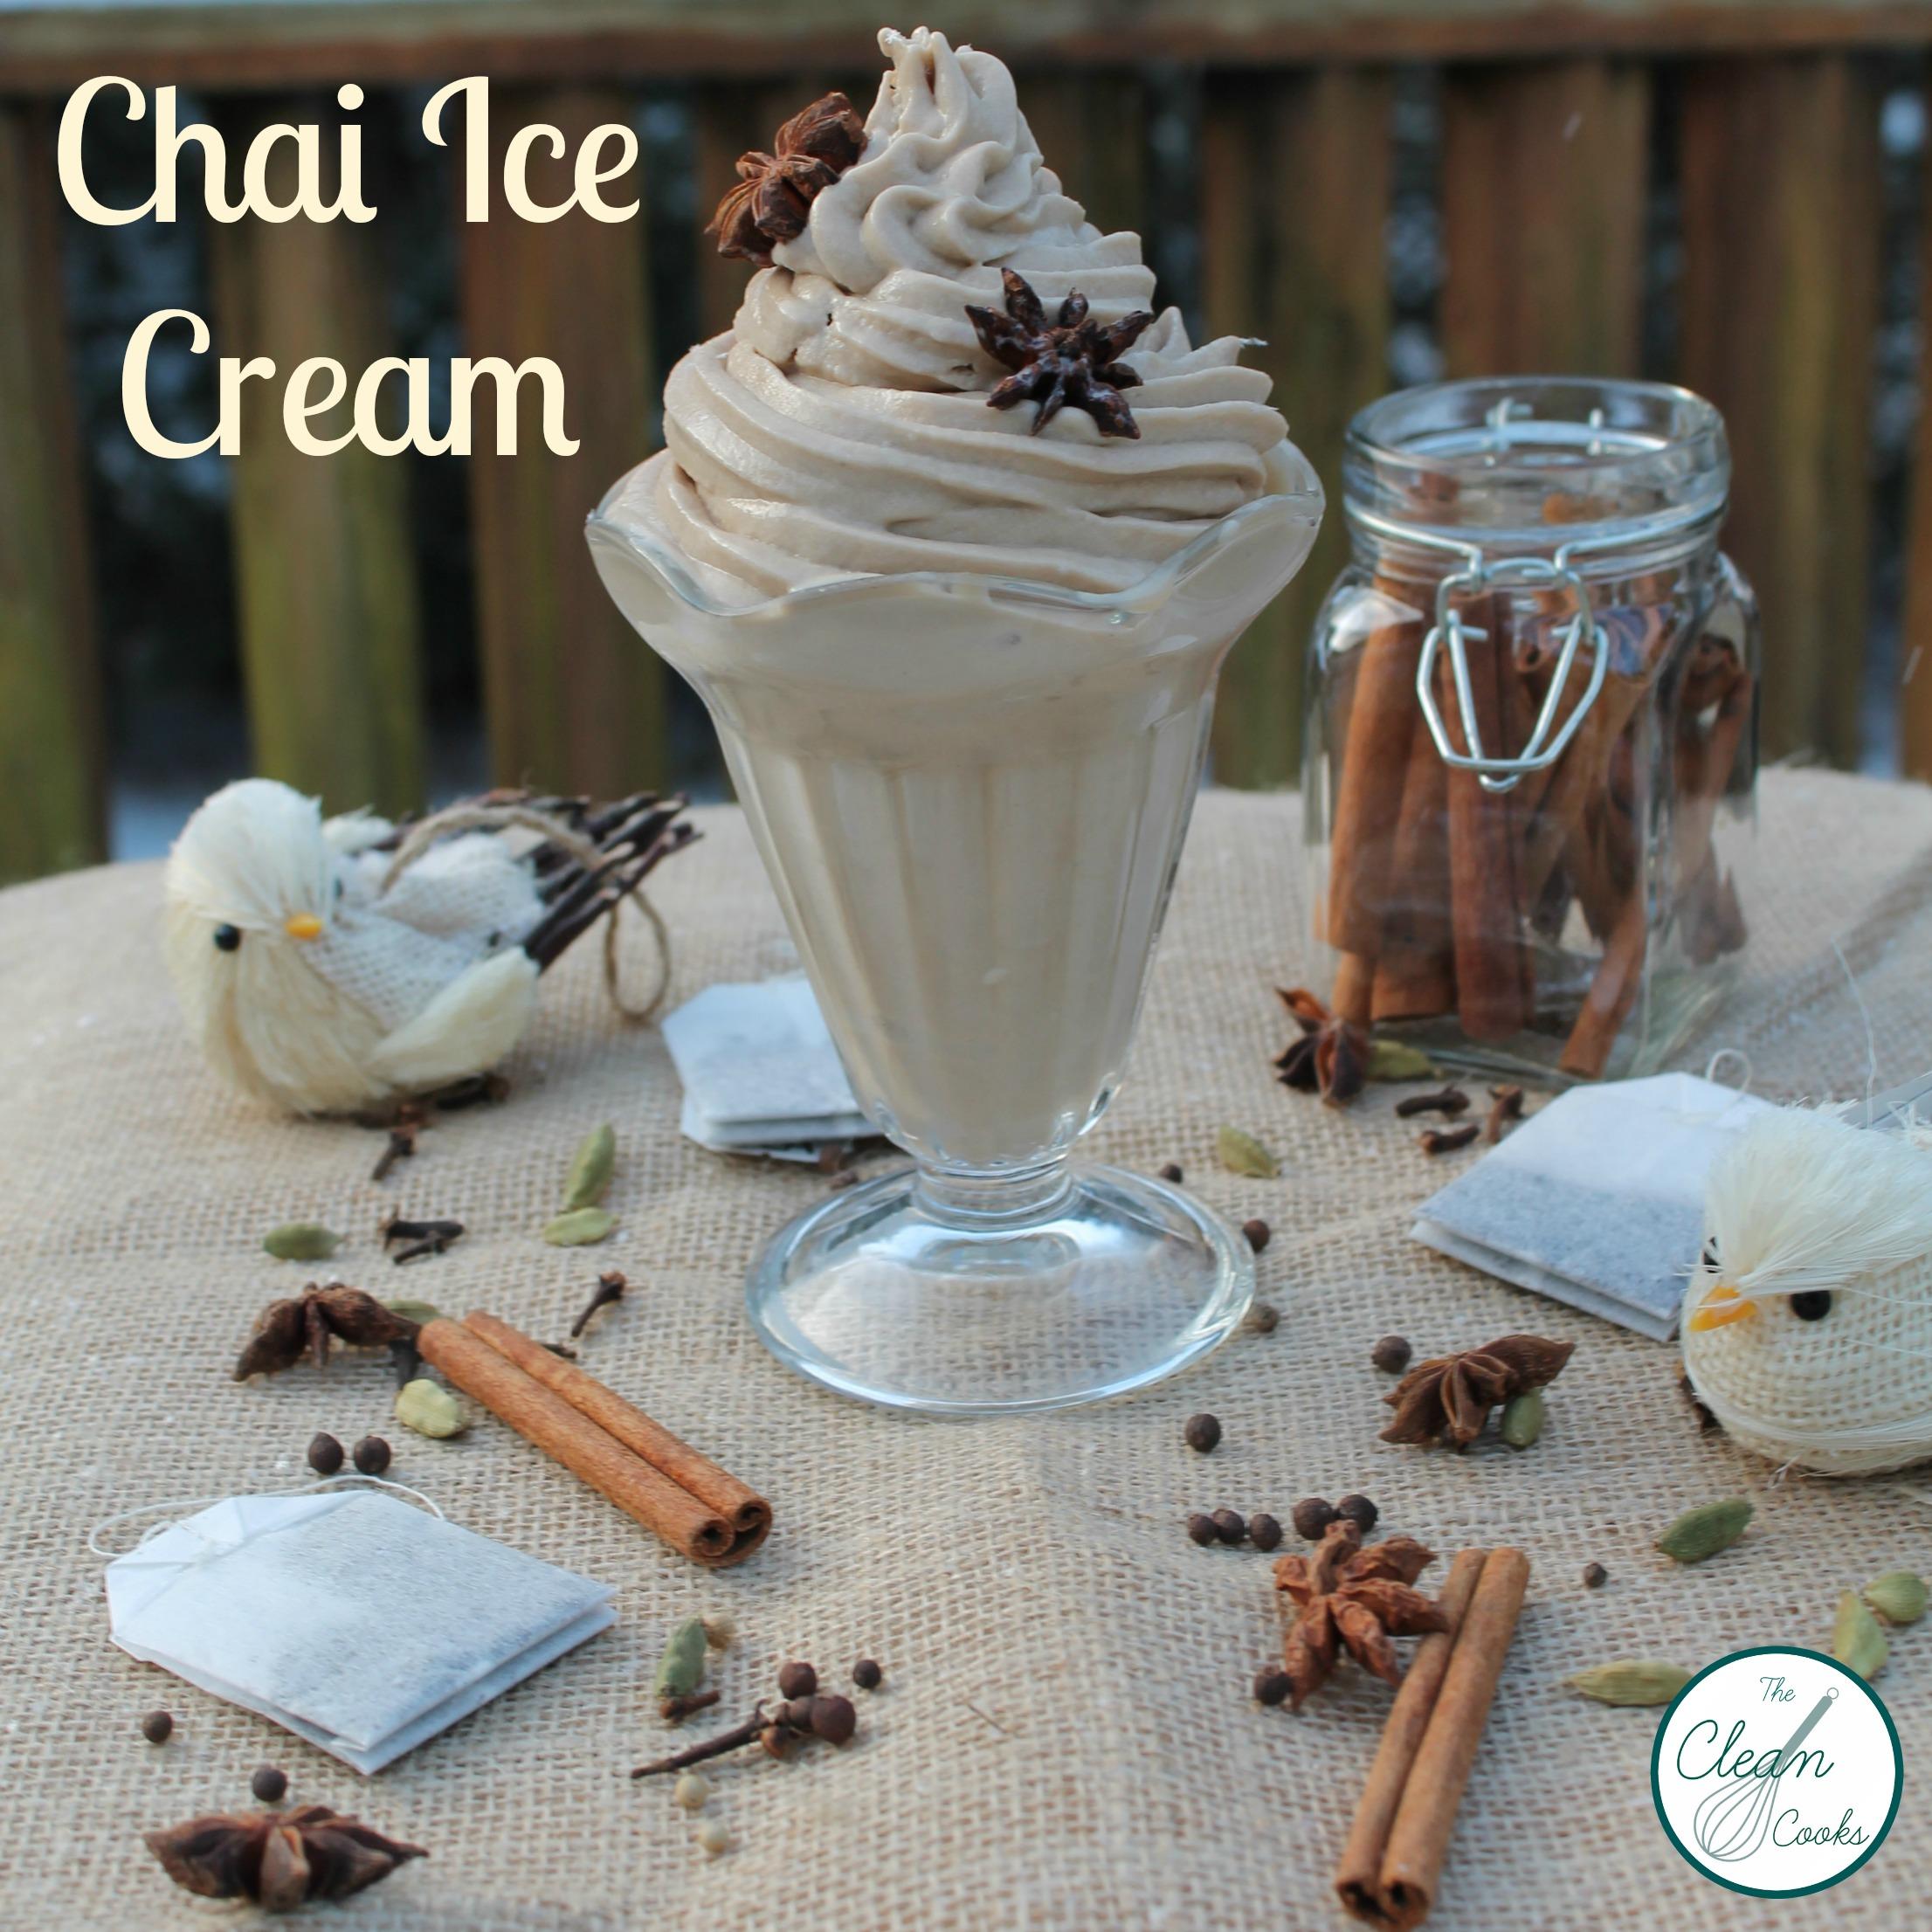 Chai Ice Cream TheCleanCooks.com